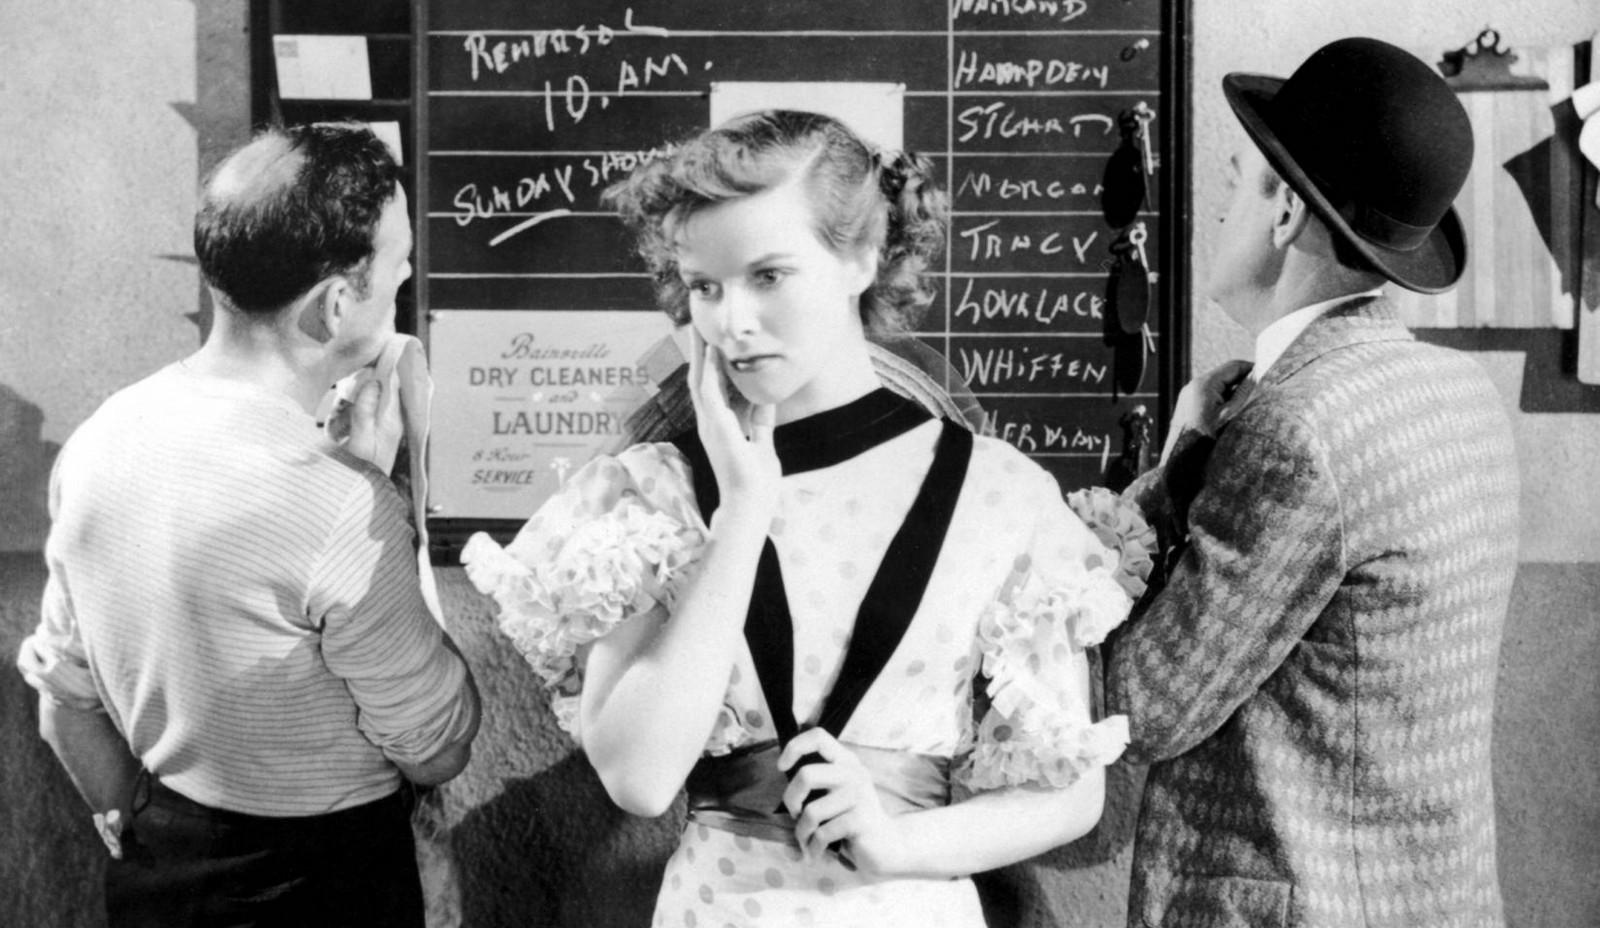 Katherine Hepburn stars in 'Morning Glory.'